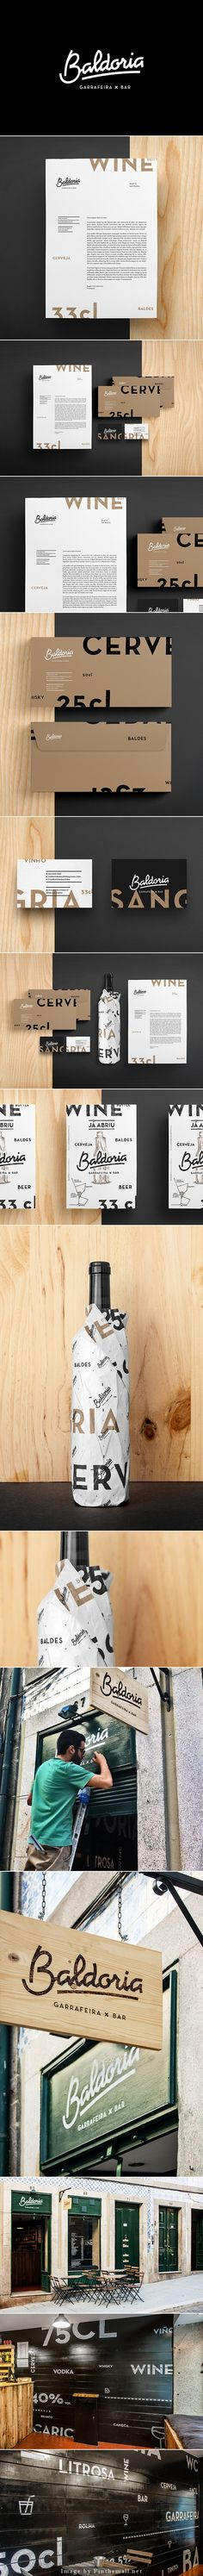 Branding Project: Baldoria – Garrafeira x Bar by Another Collective